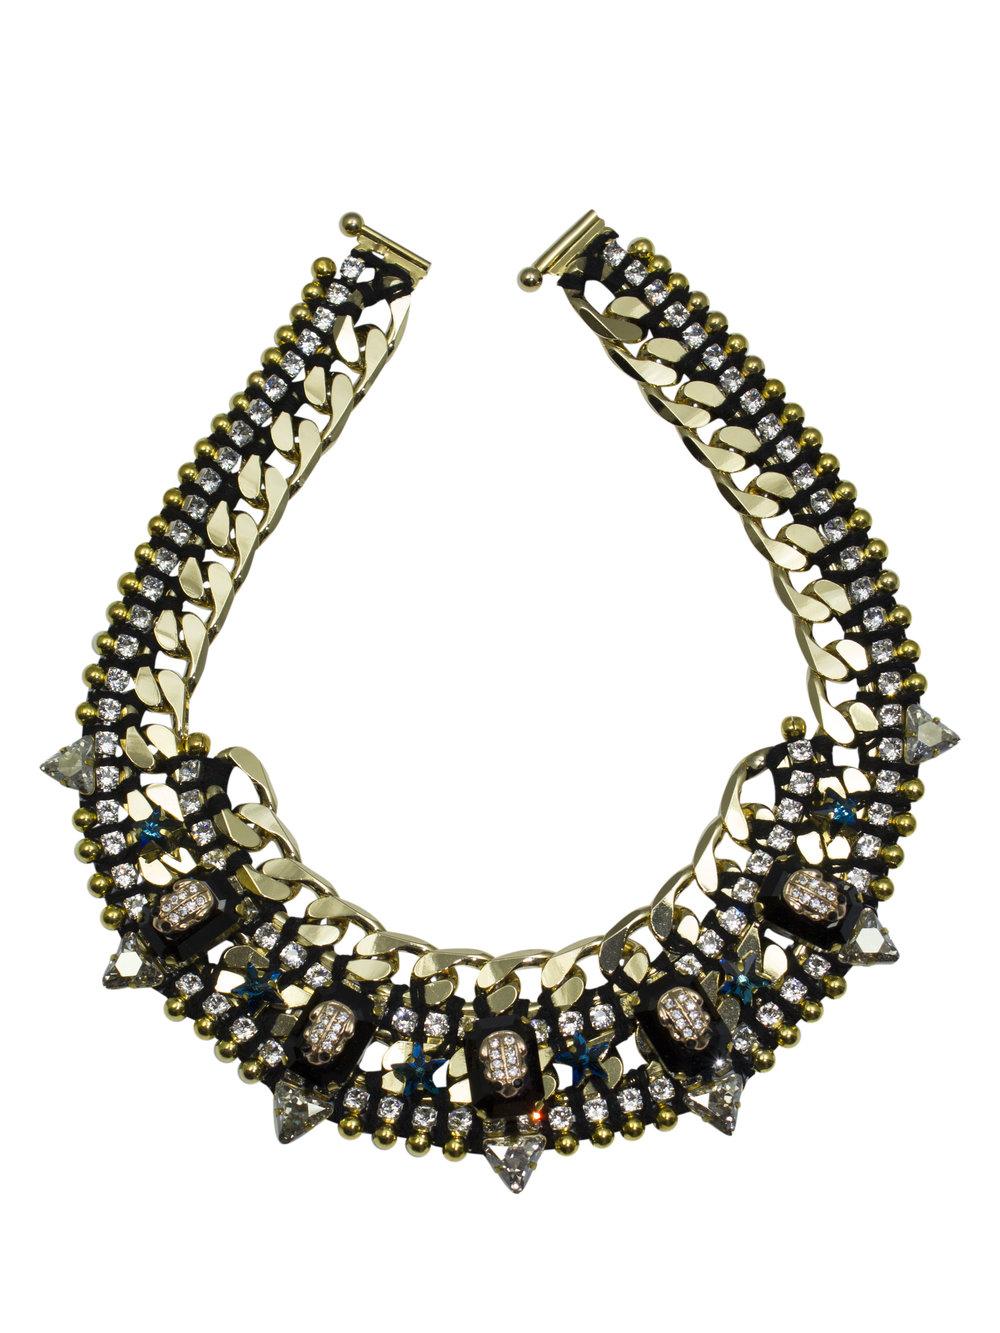 210N Black & Crystal Star Military Necklace.jpg